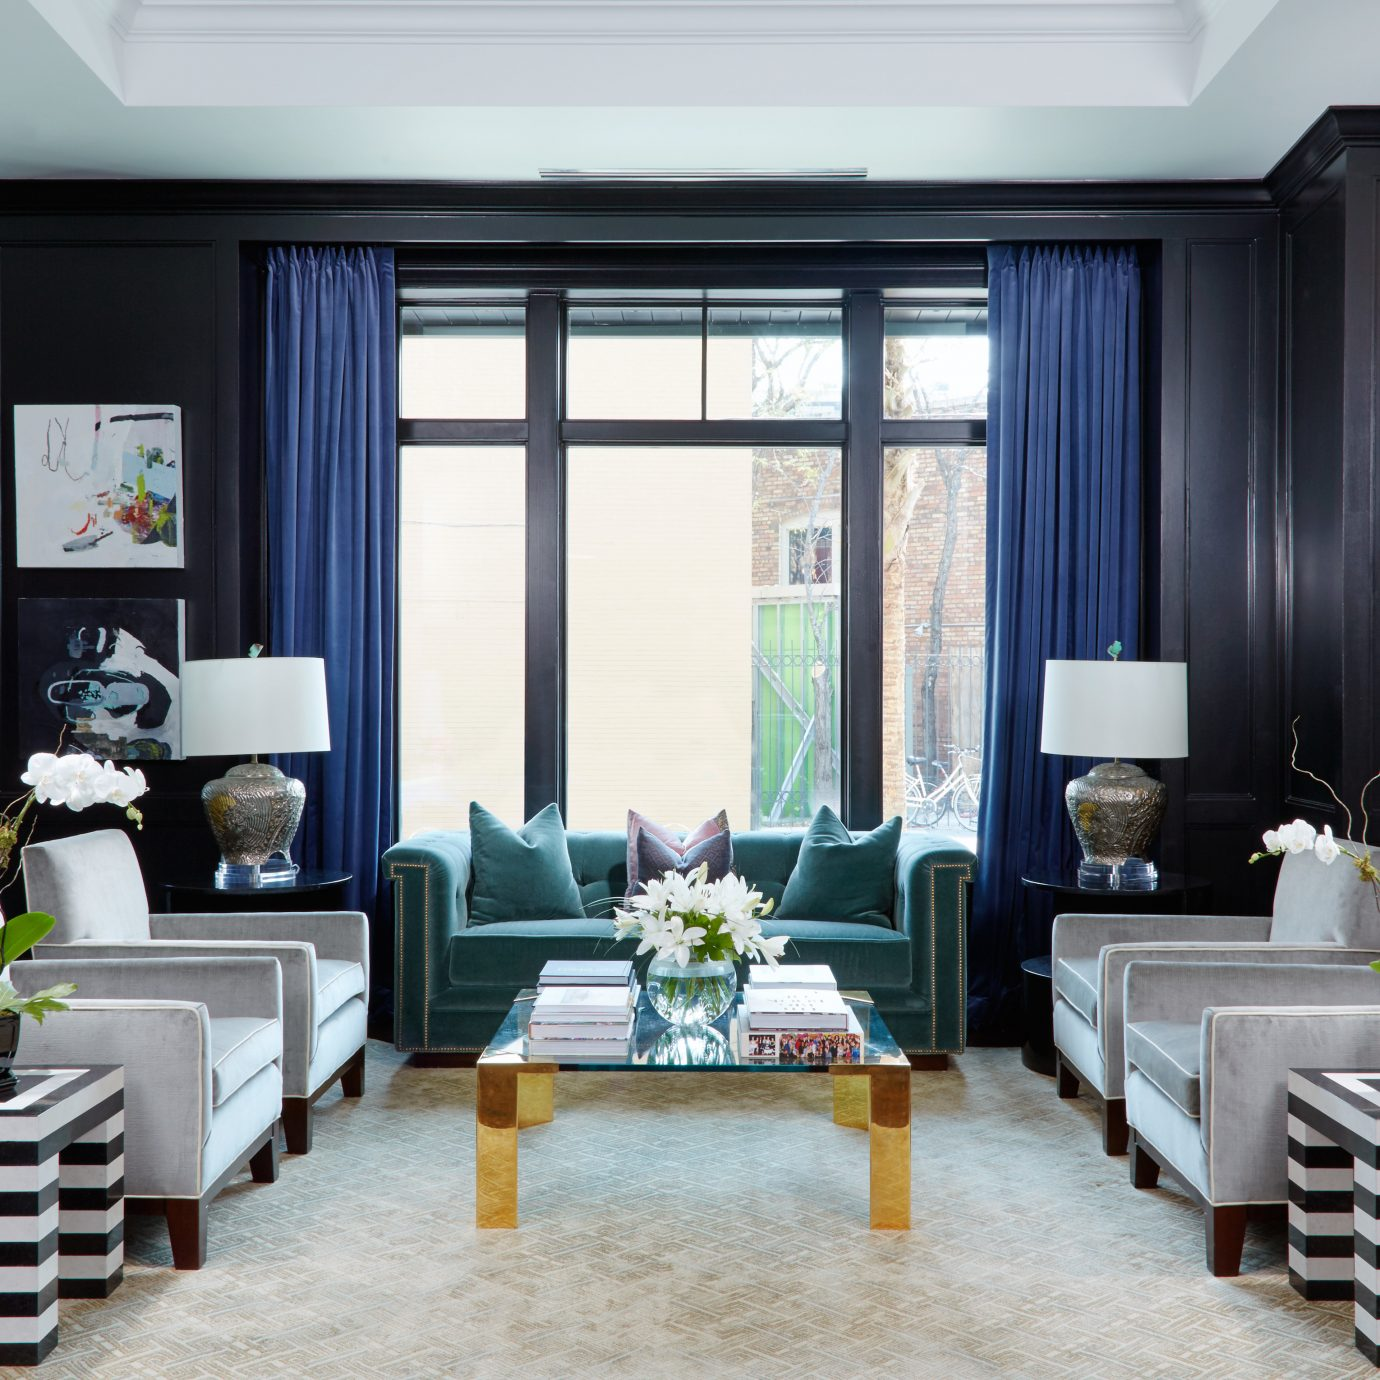 Hip Hotels Lounge Modern Romance Trip Ideas living room property home Suite condominium